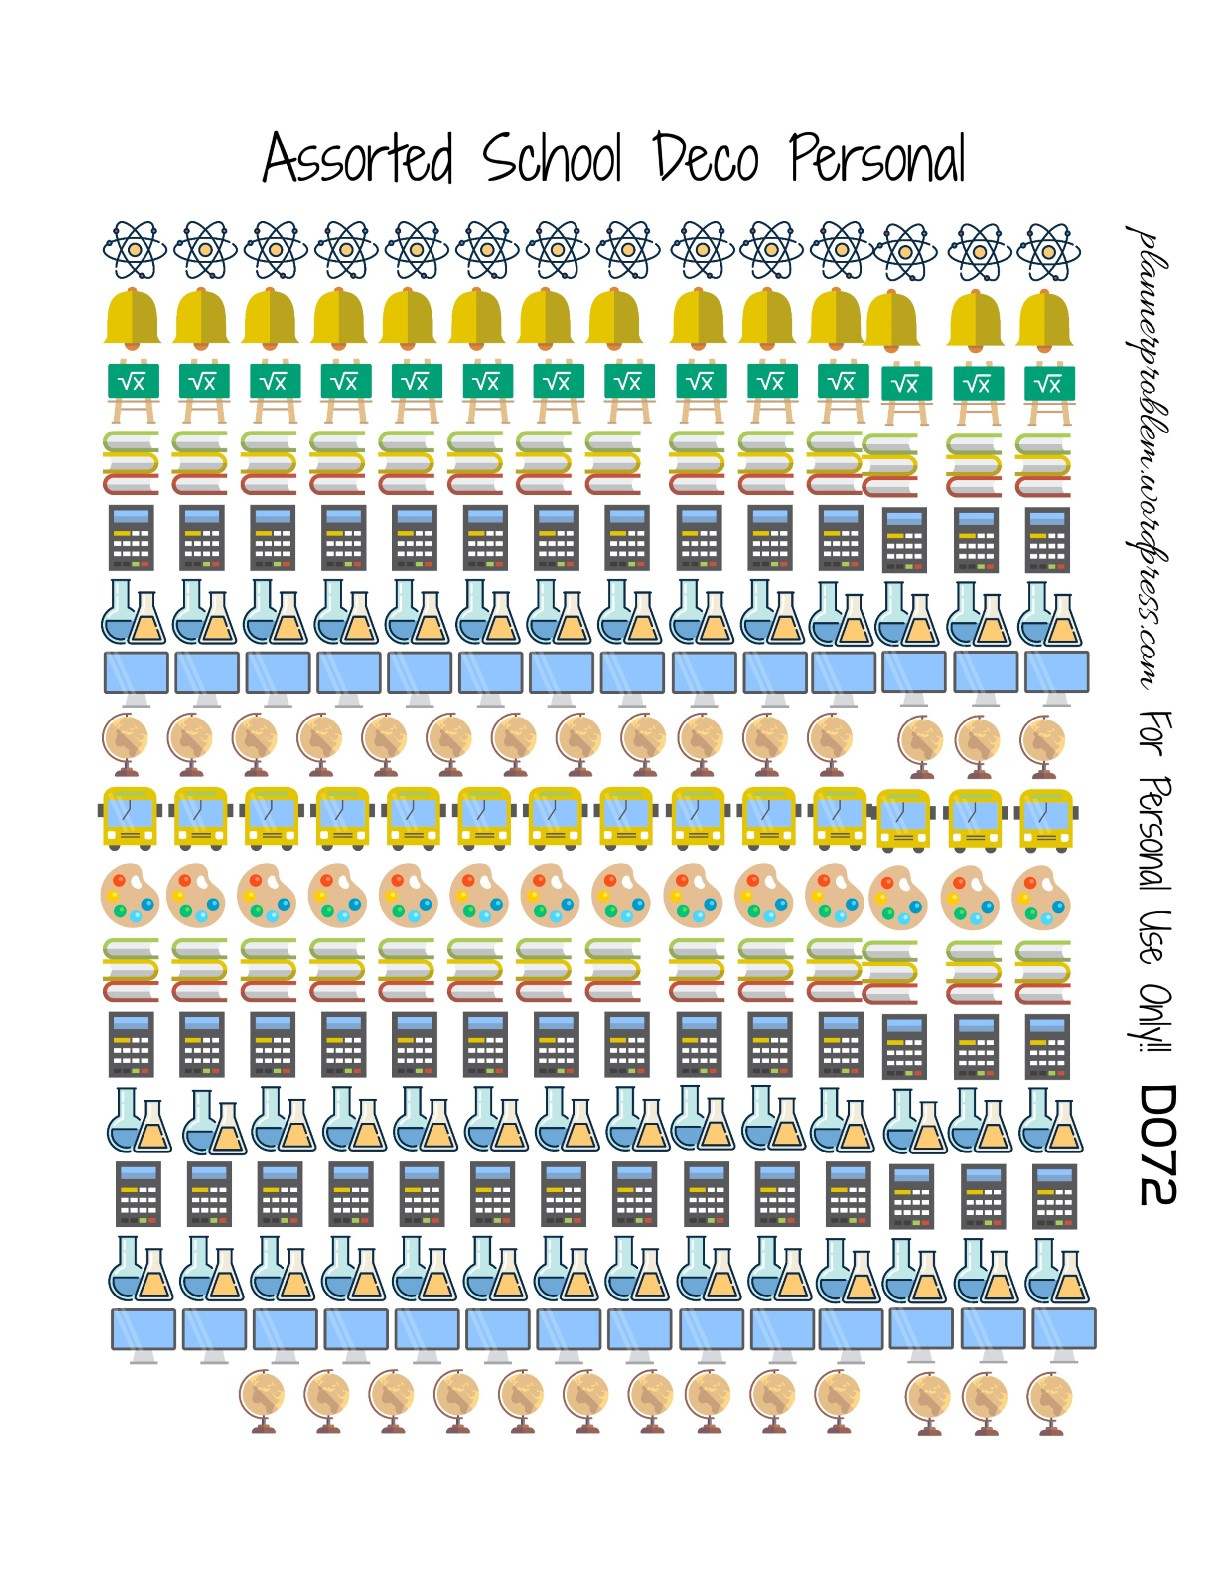 Multicolor School Icons & School Deco! | Free Printable Planner - Free Printable Icons